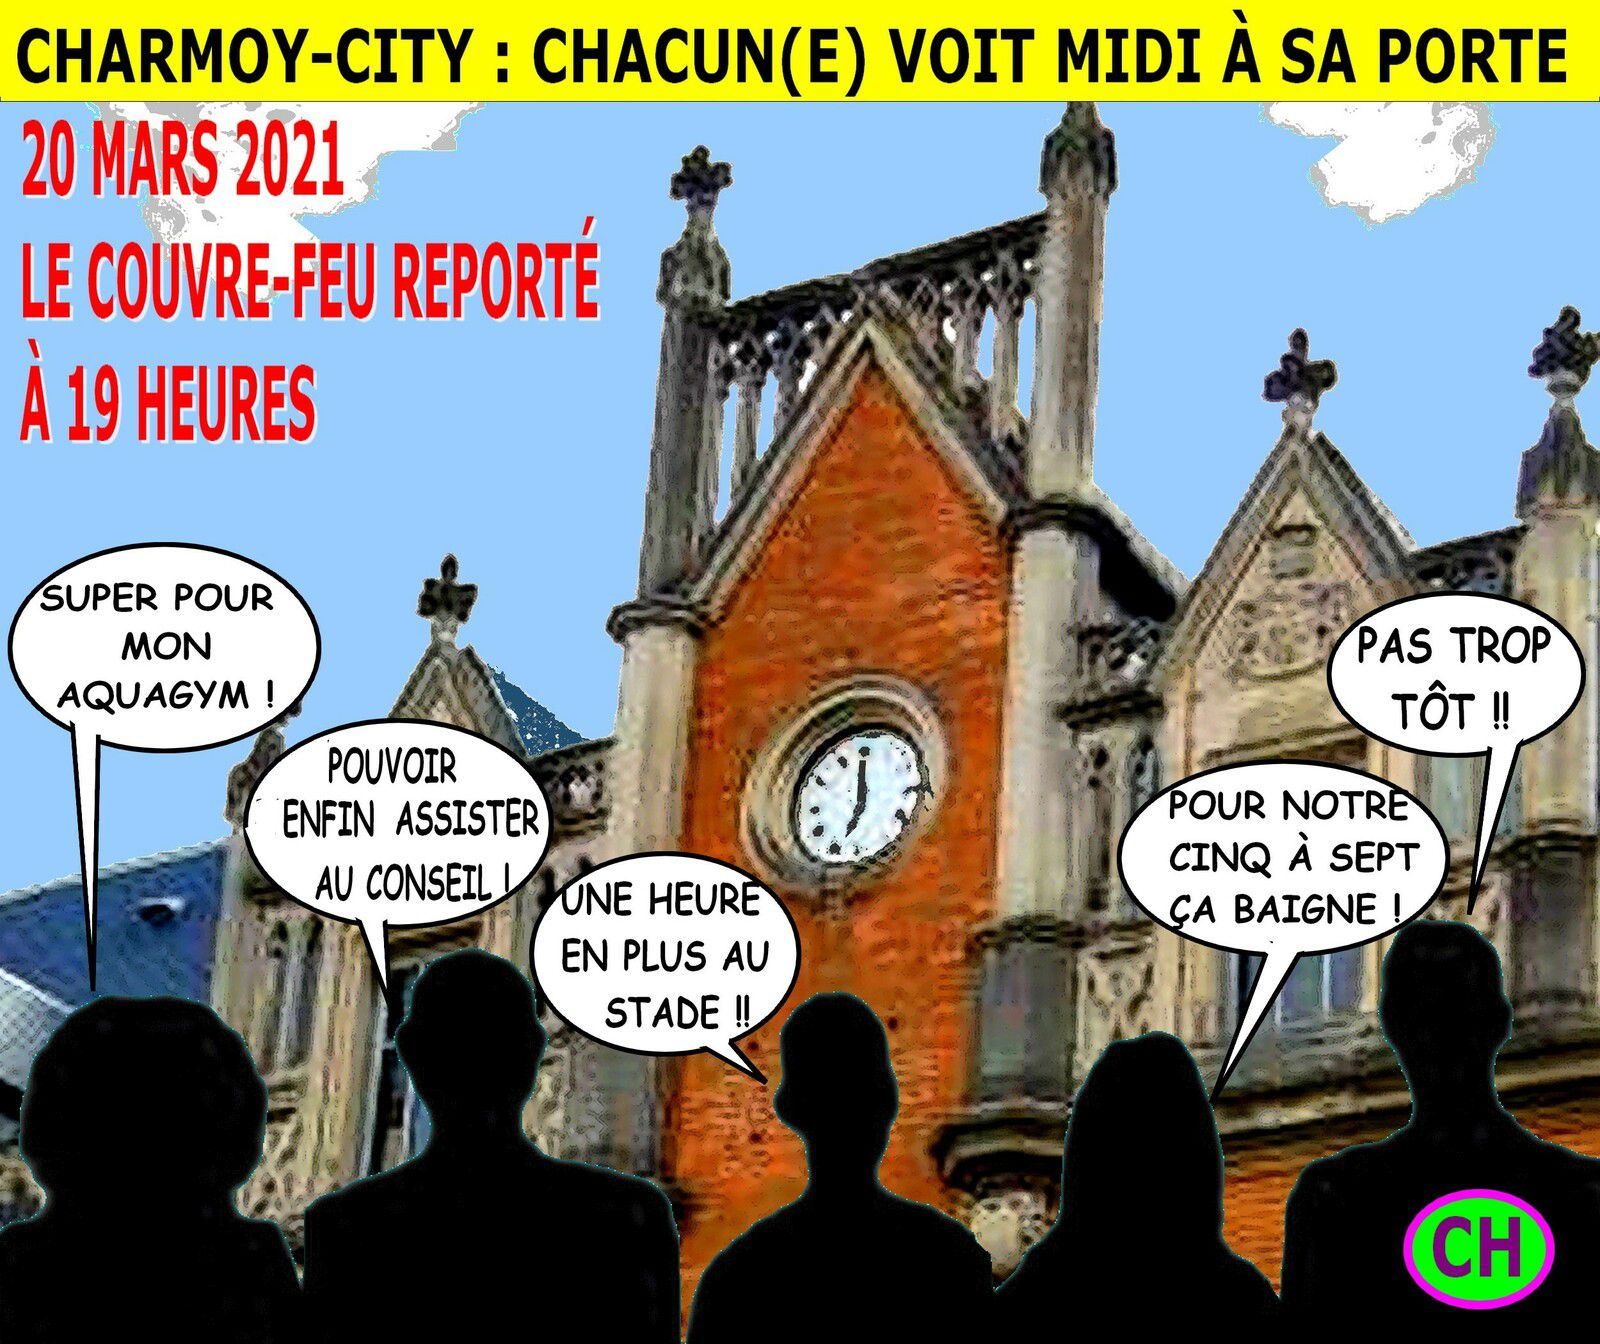 Charmoy-City, chacun voit midi à sa porte.jpg